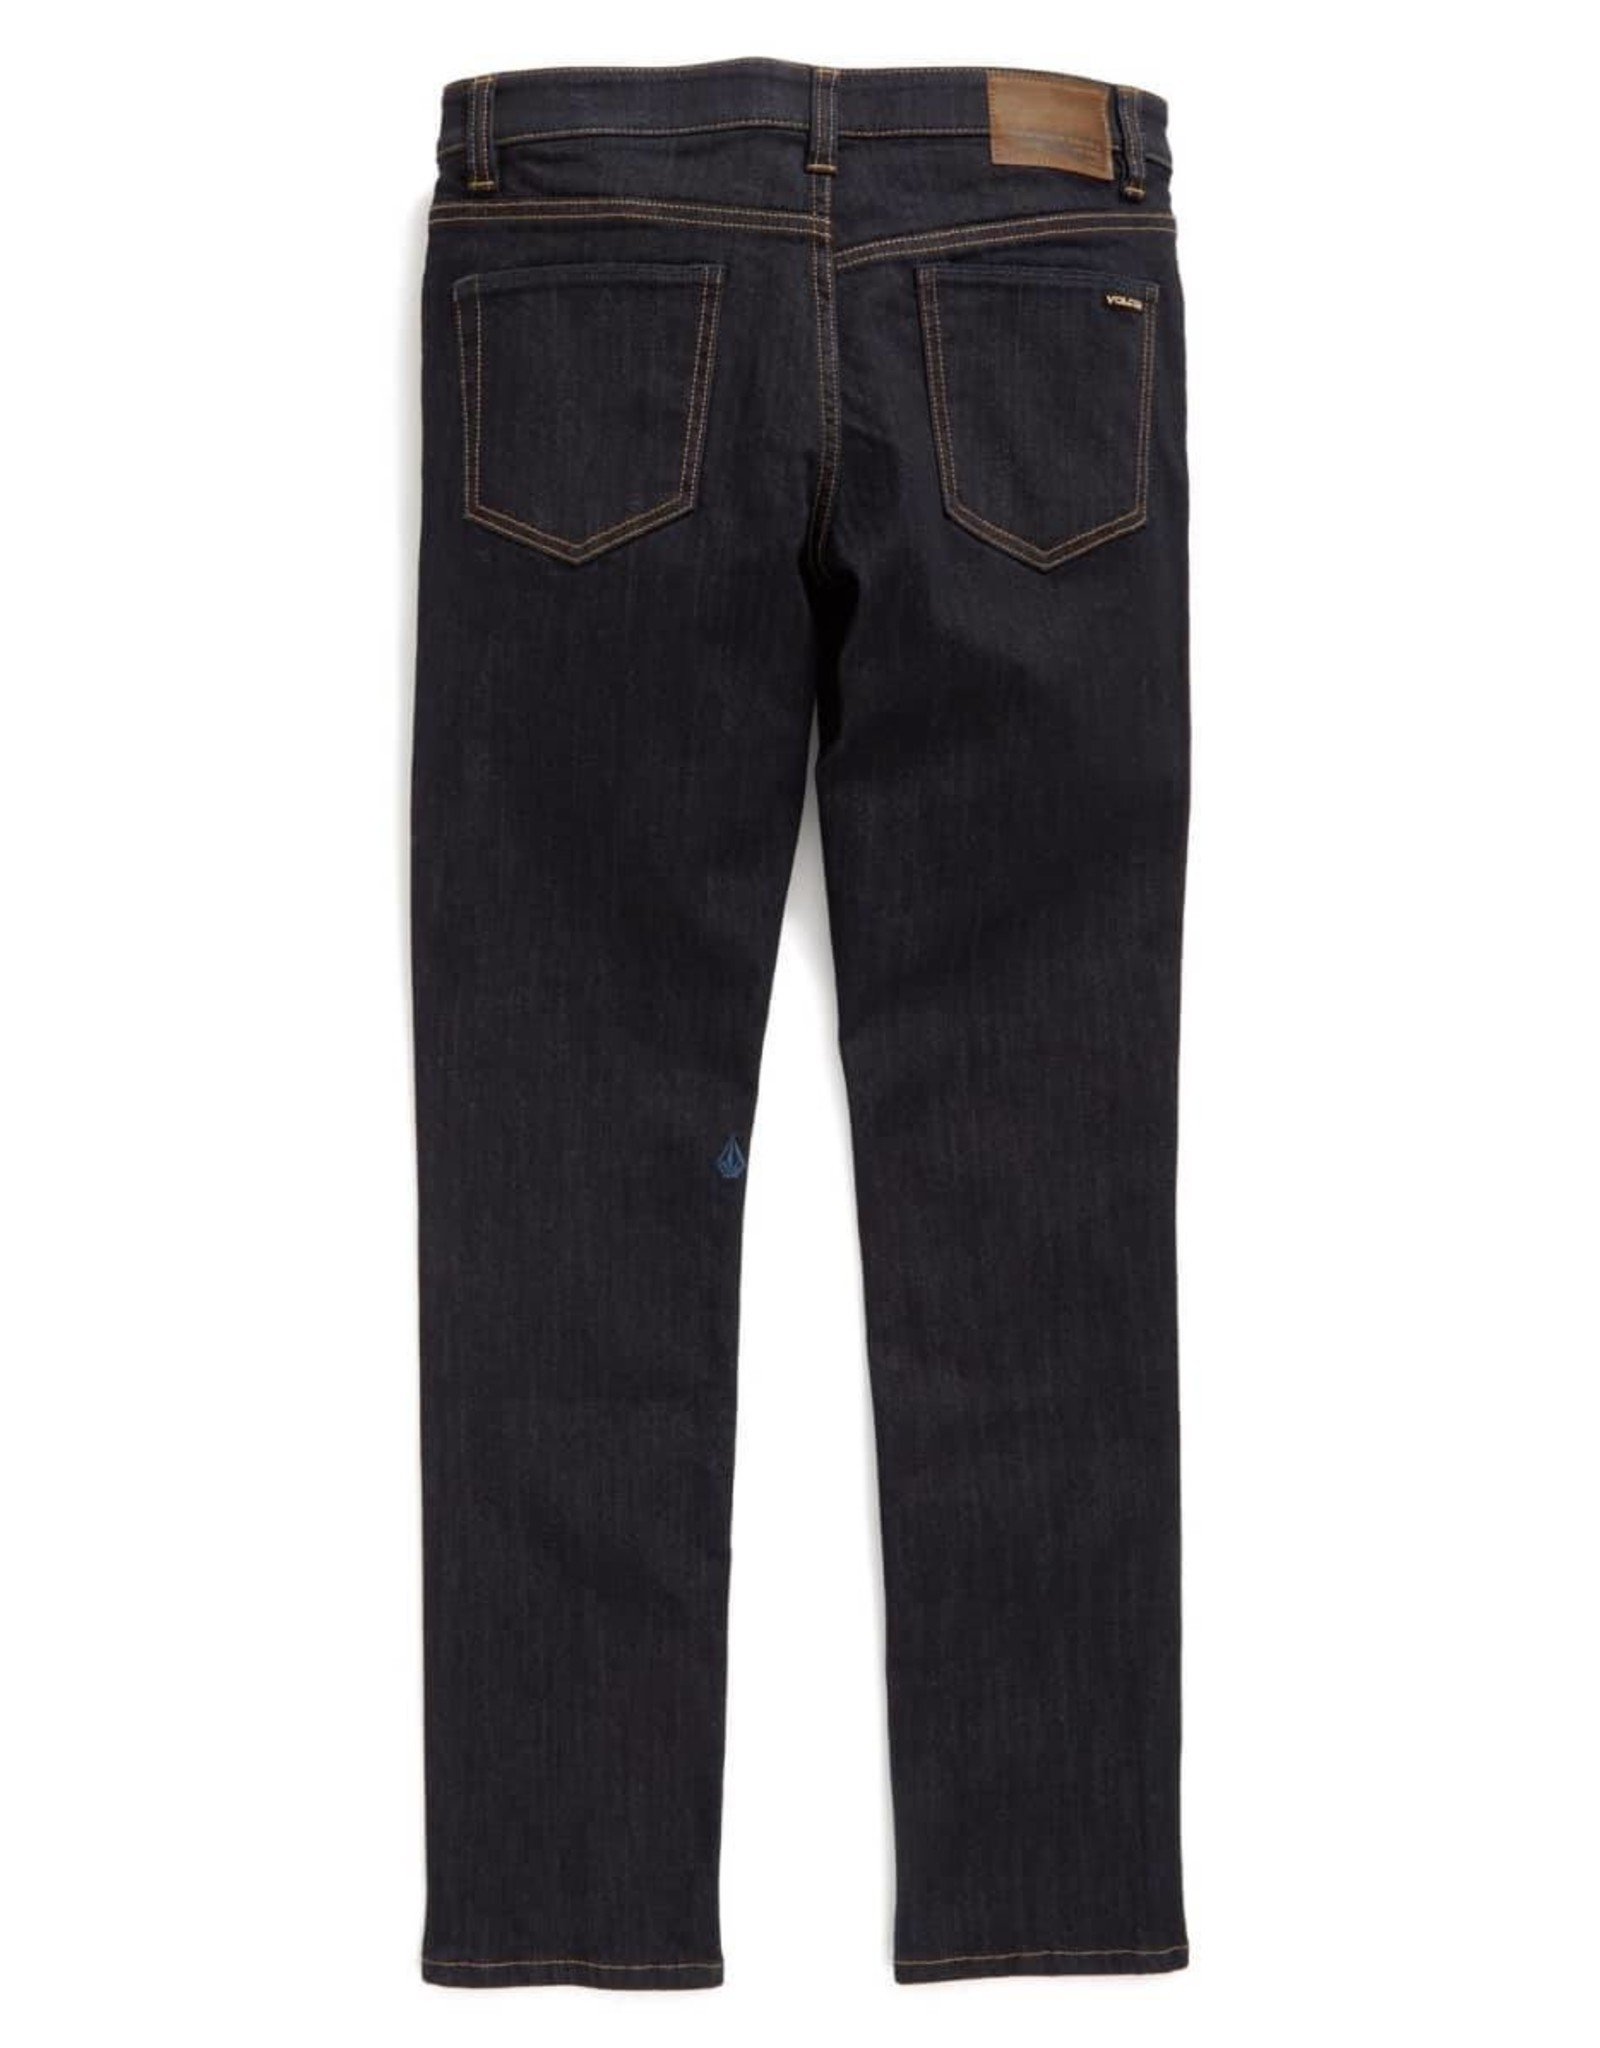 volcom Volcom - Jeans  junior 2x4 skinny